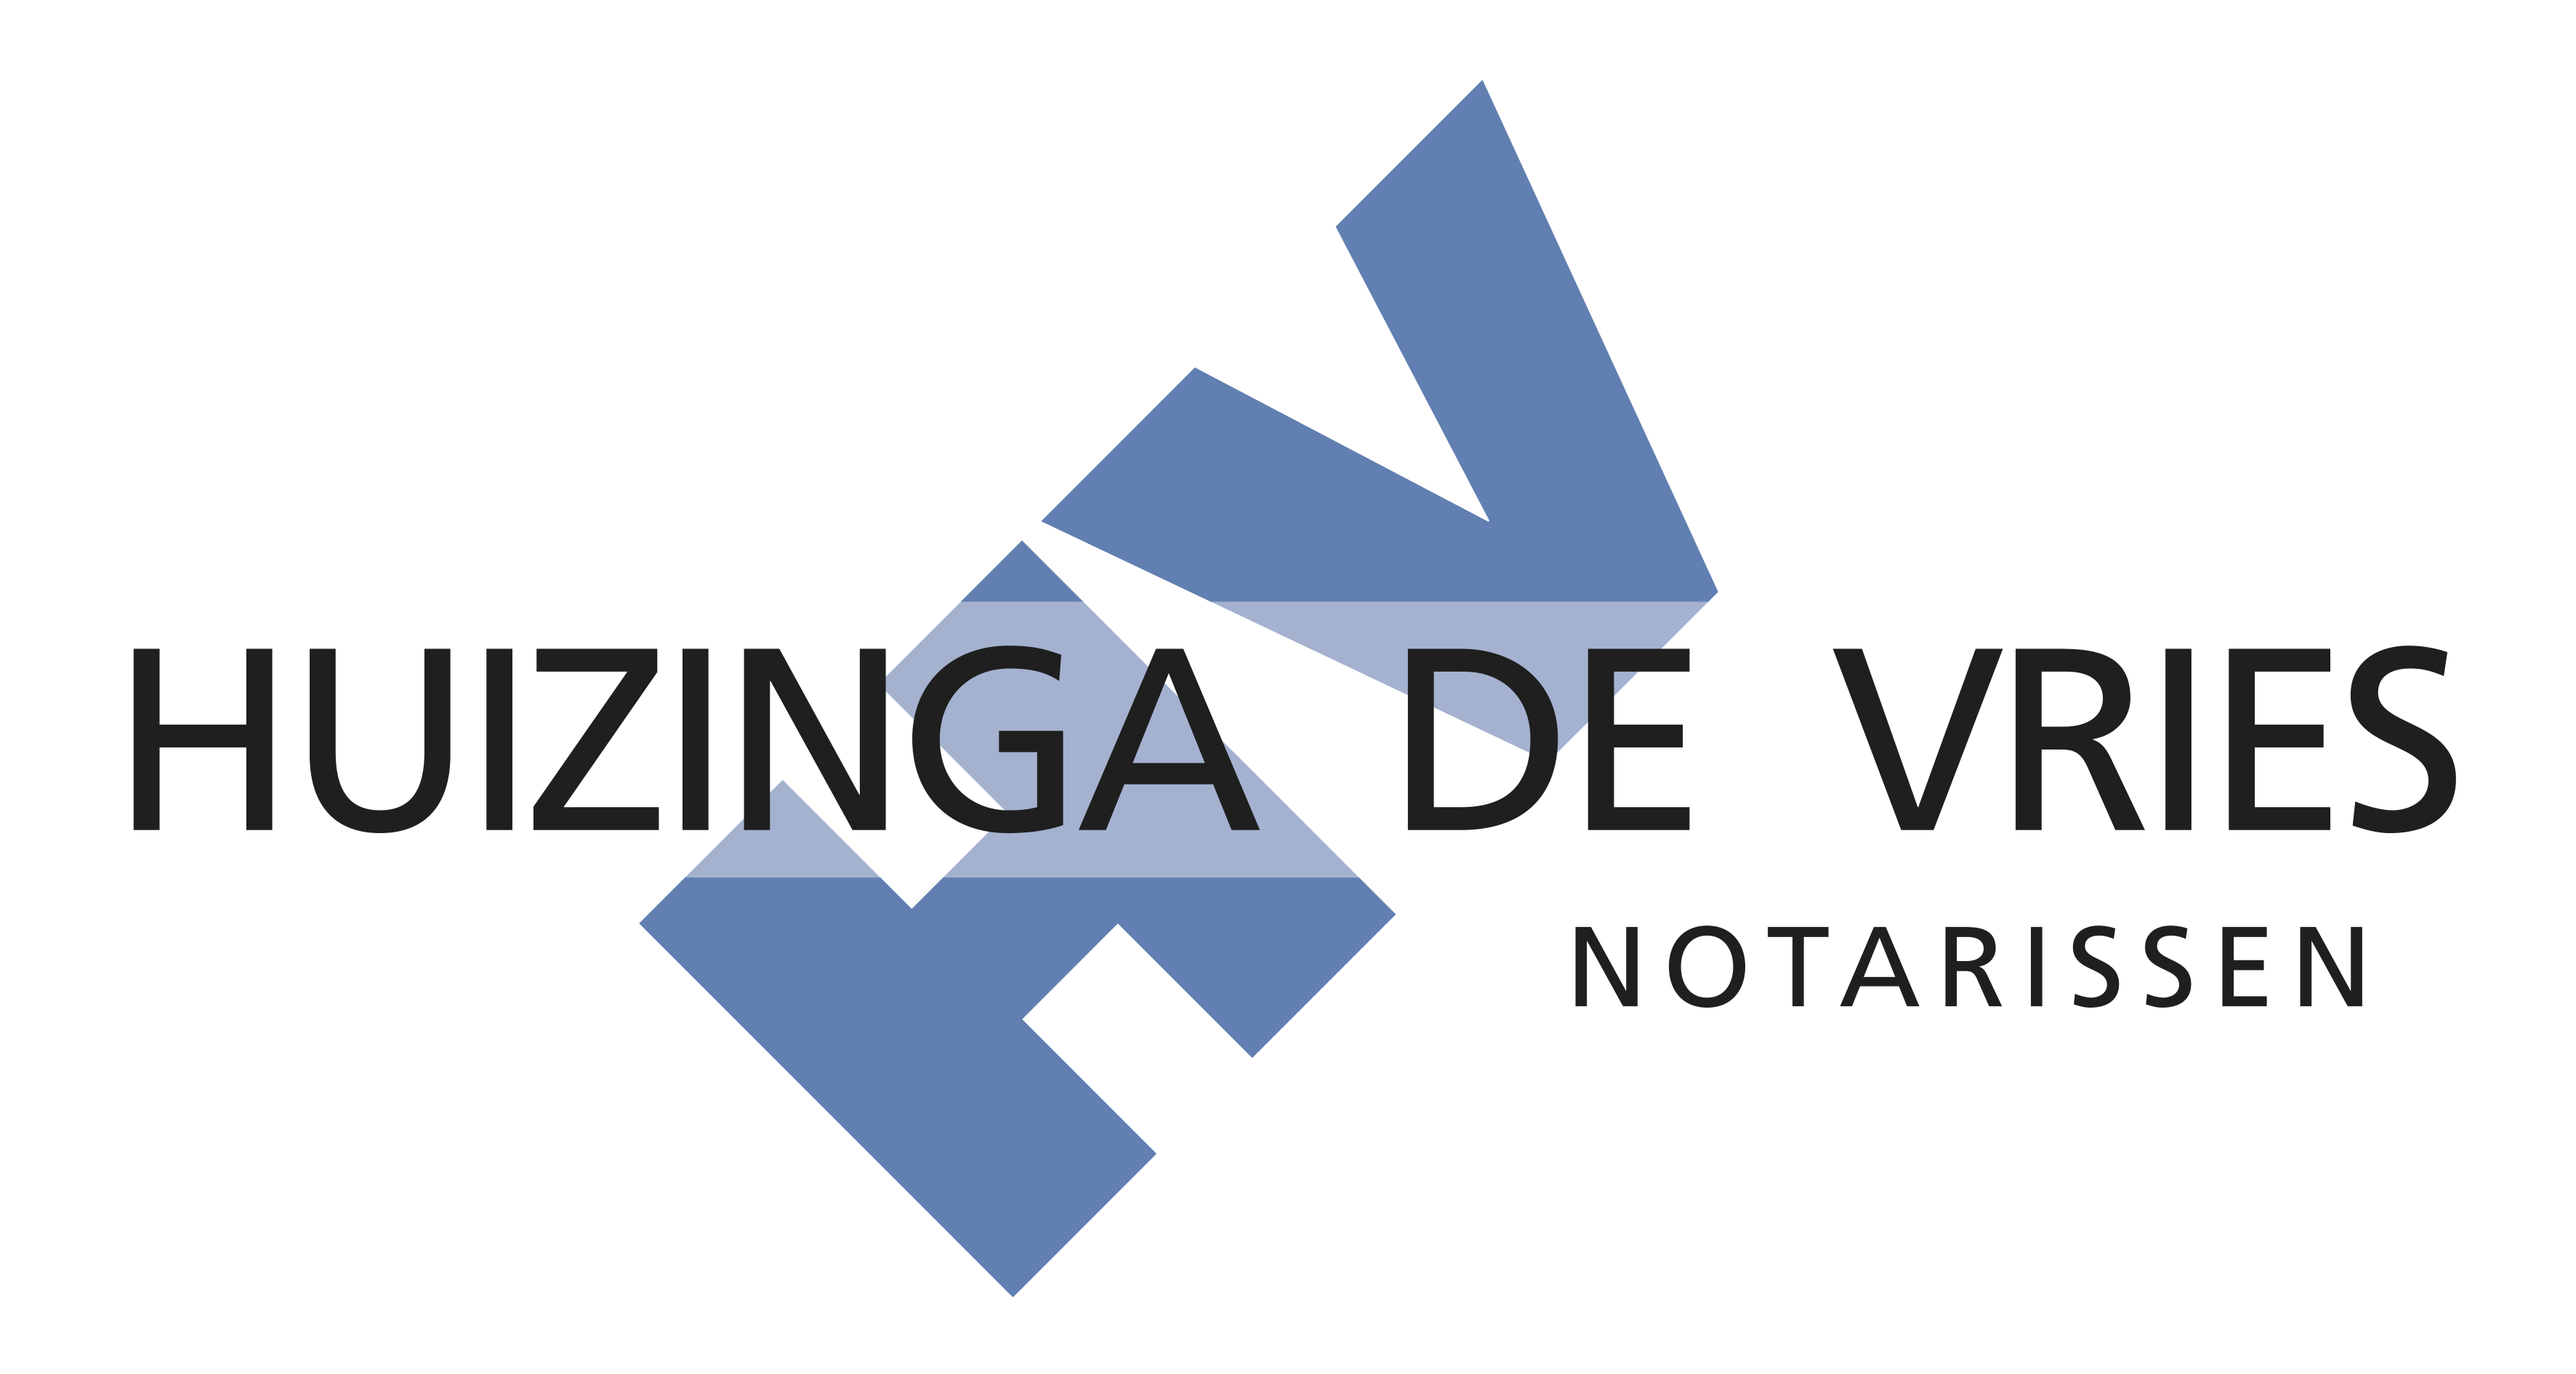 Huizinga De Vries Notarissen